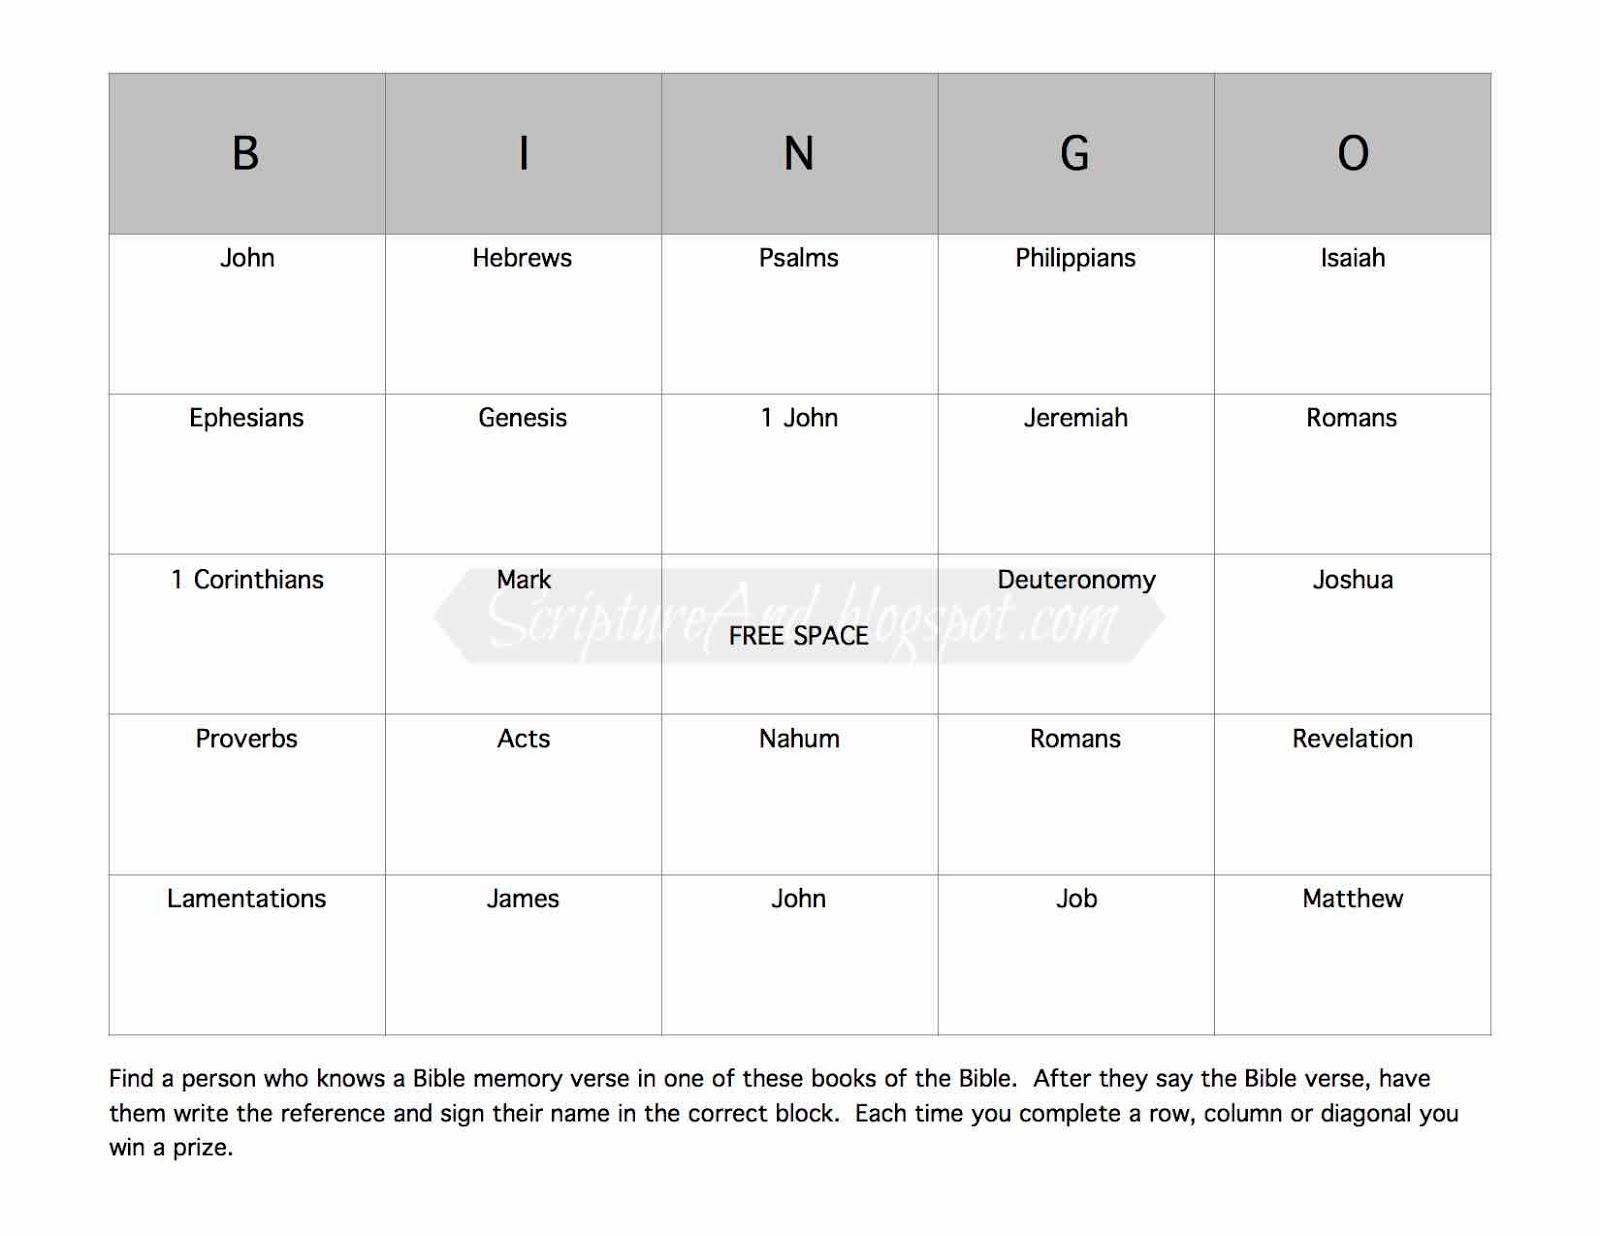 Scripture And Bible Memory Verse Signature Bingo